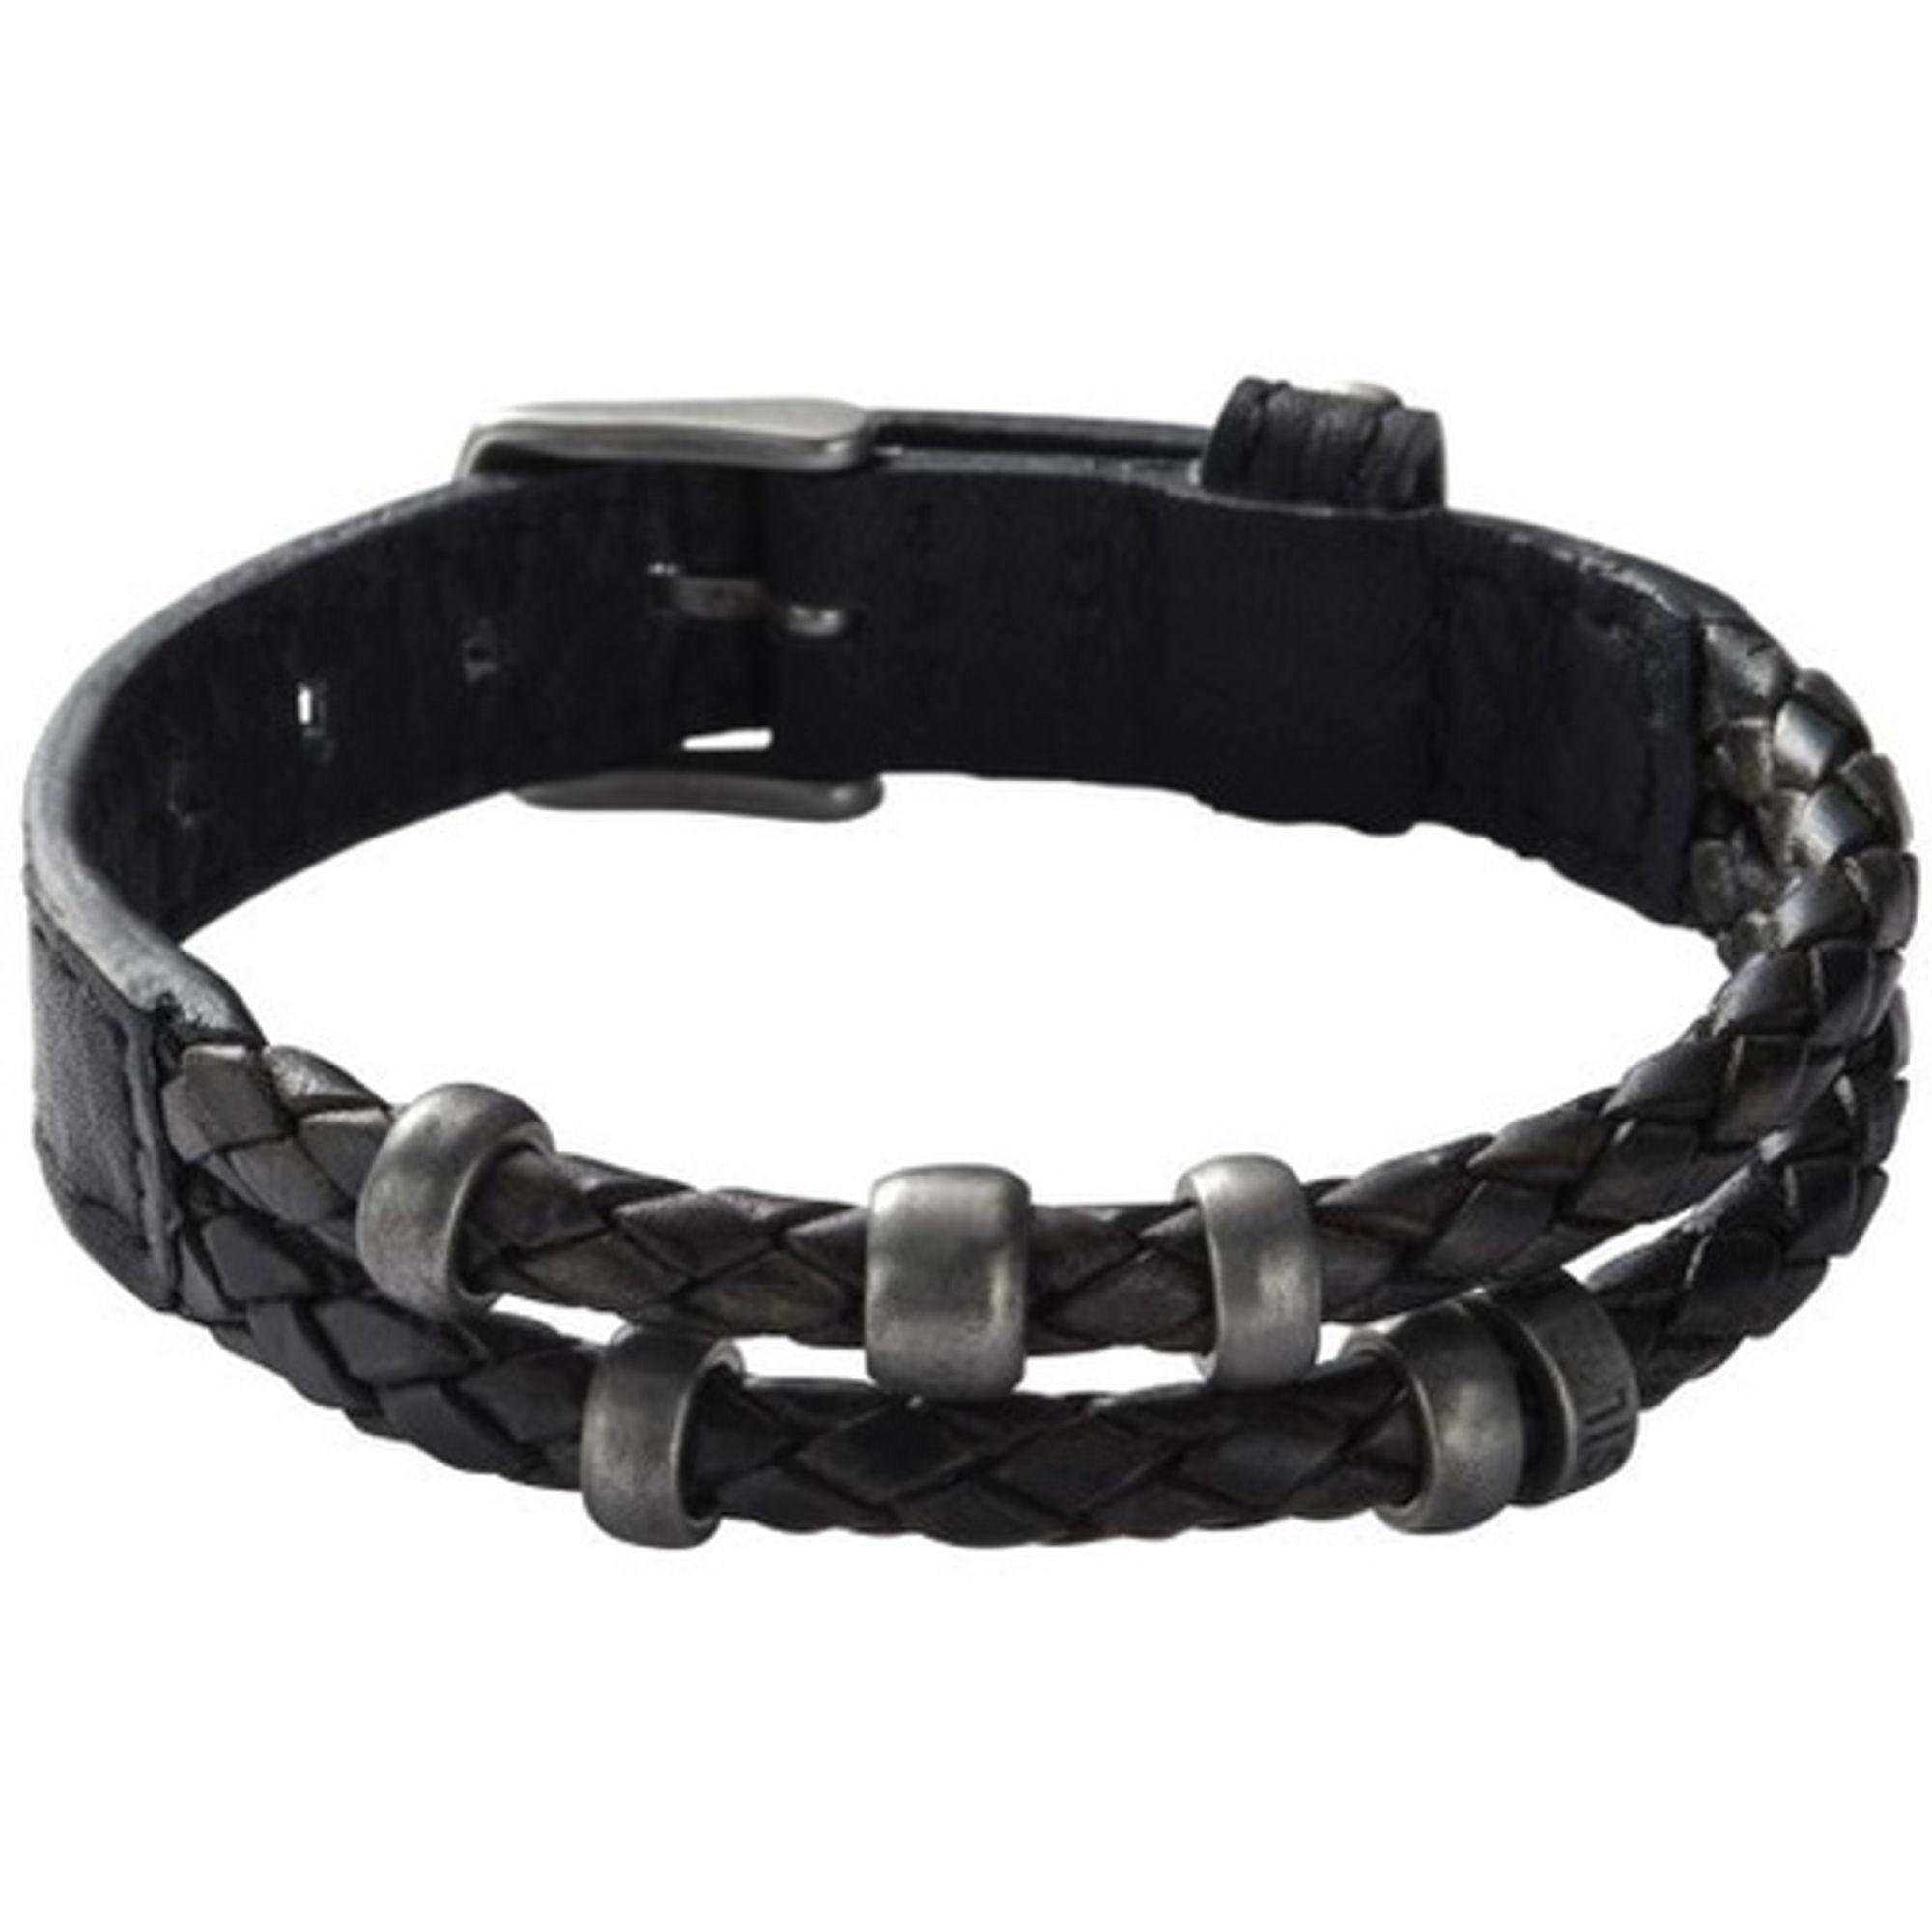 Fossil JF85460 Herren Armband JF 85460 Leder schwarz used Look